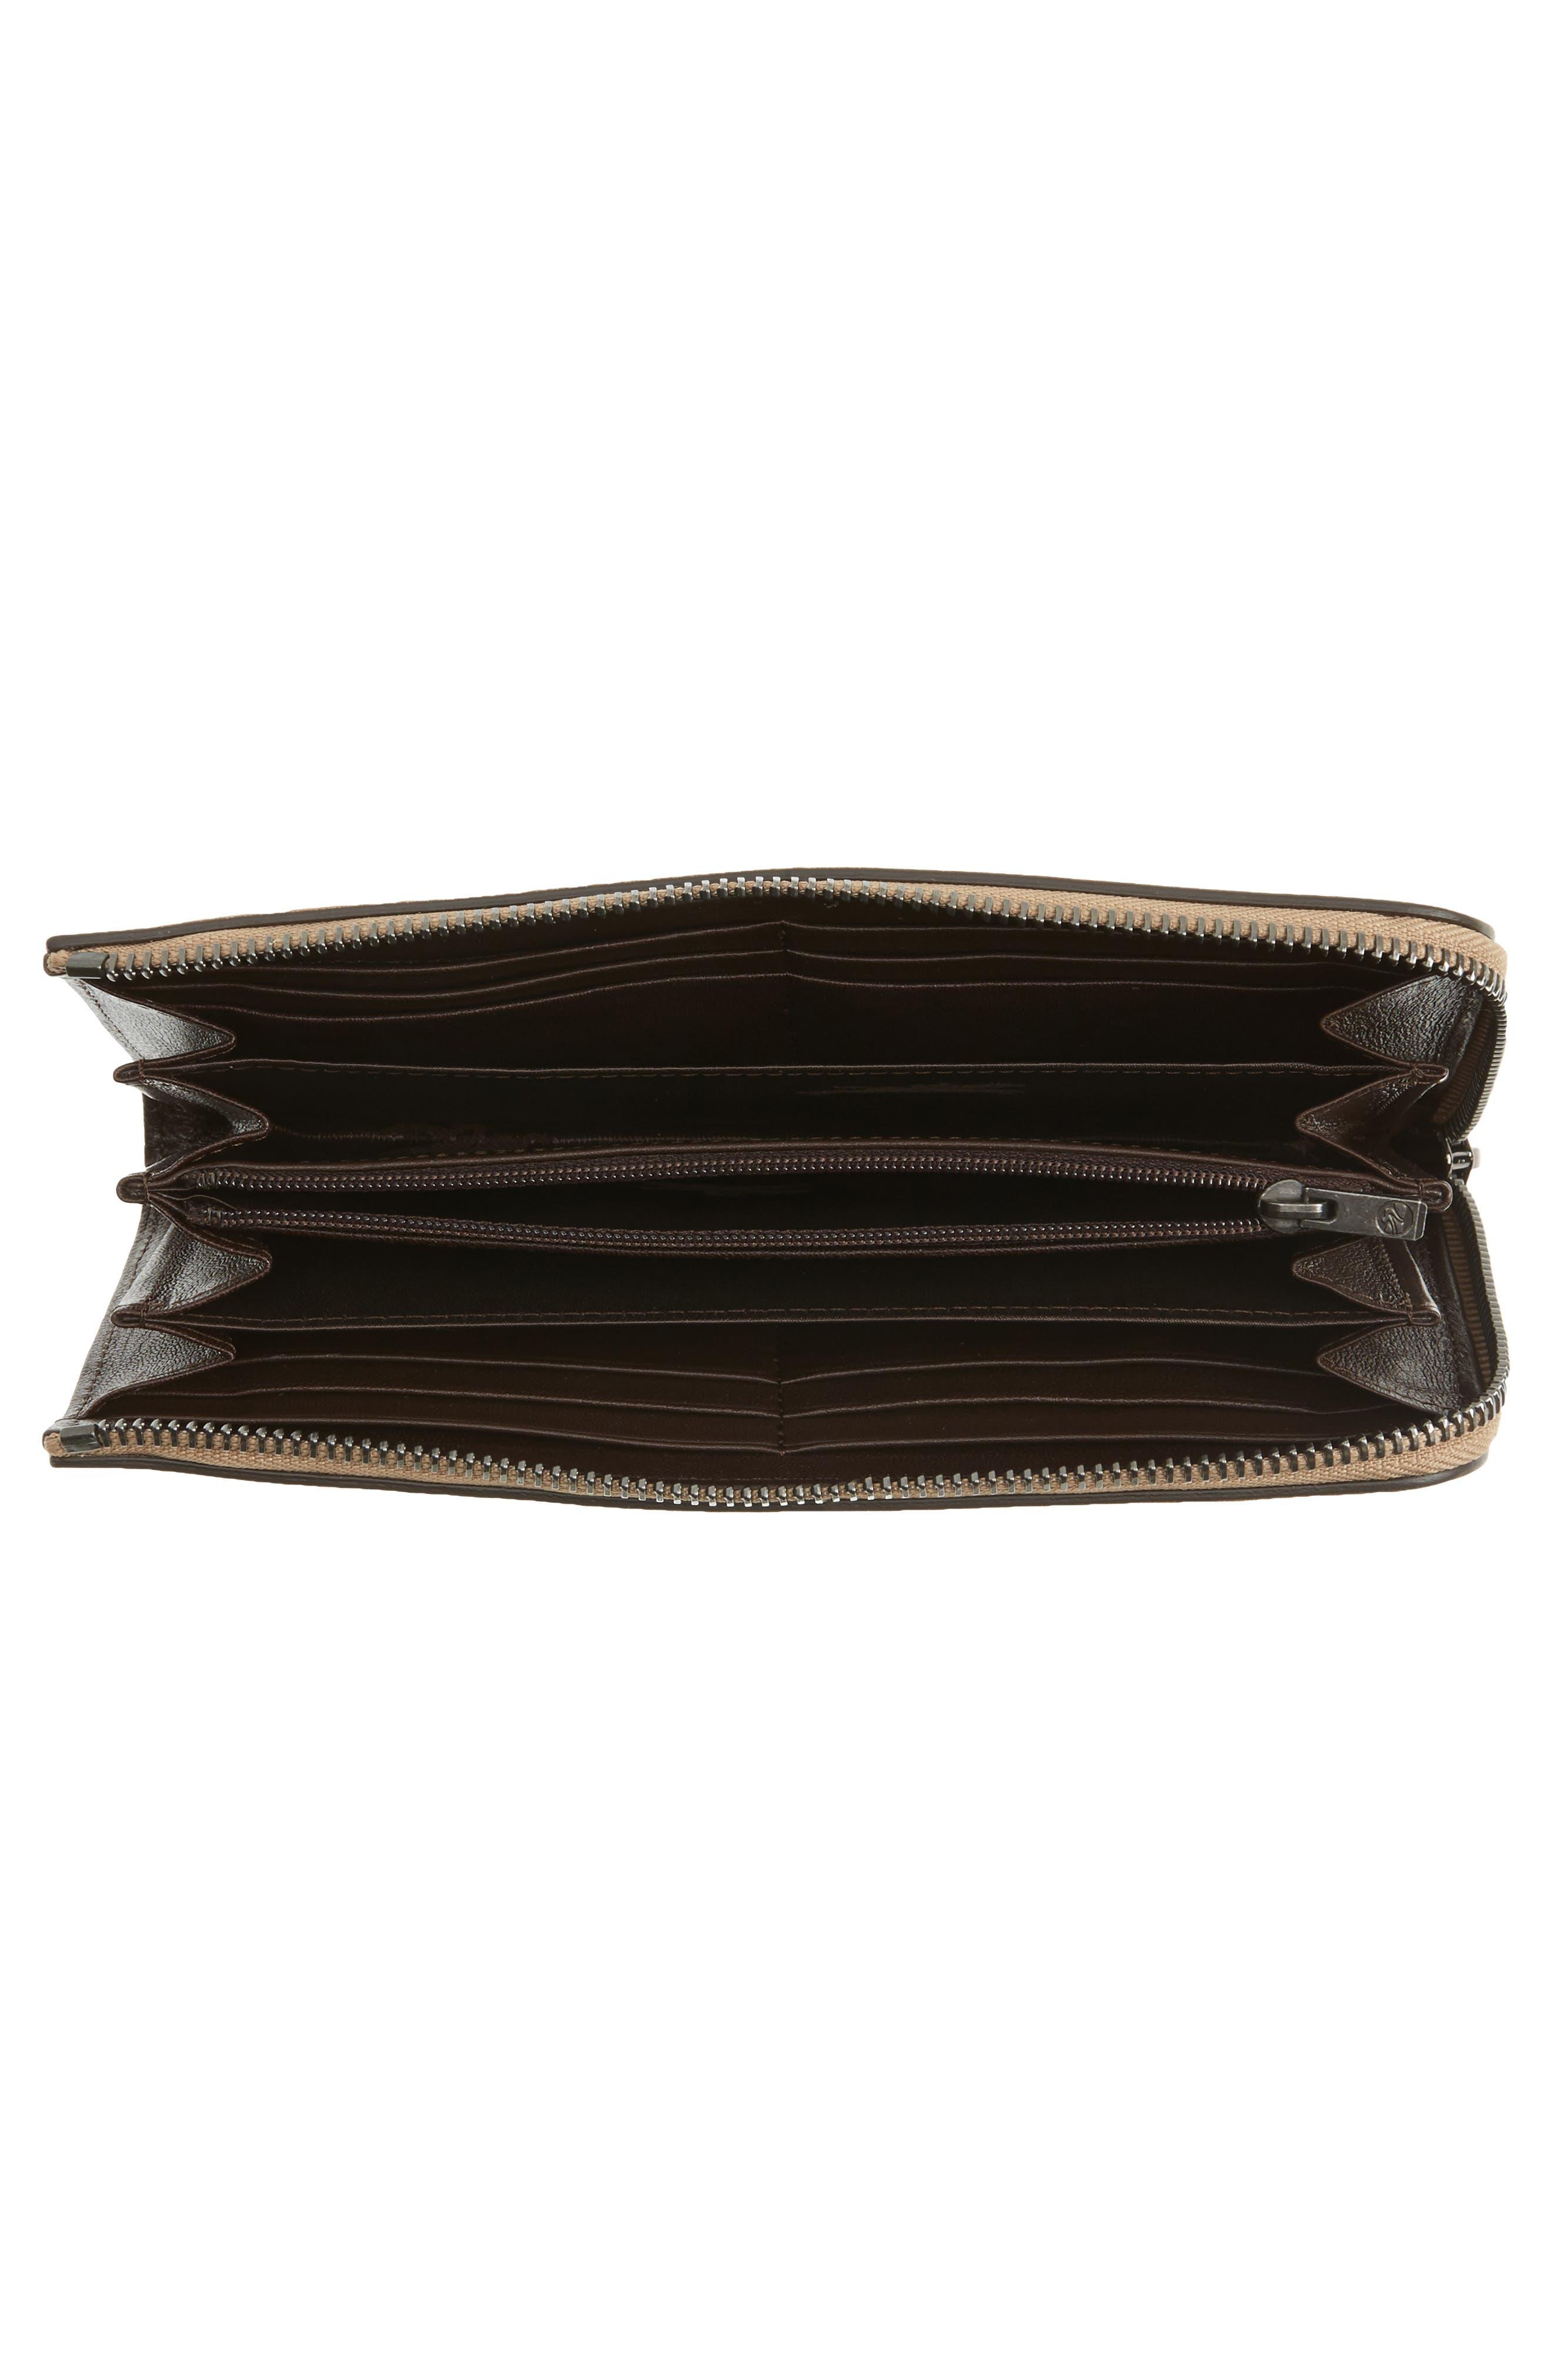 3D Leather Wallet,                             Alternate thumbnail 4, color,                             250